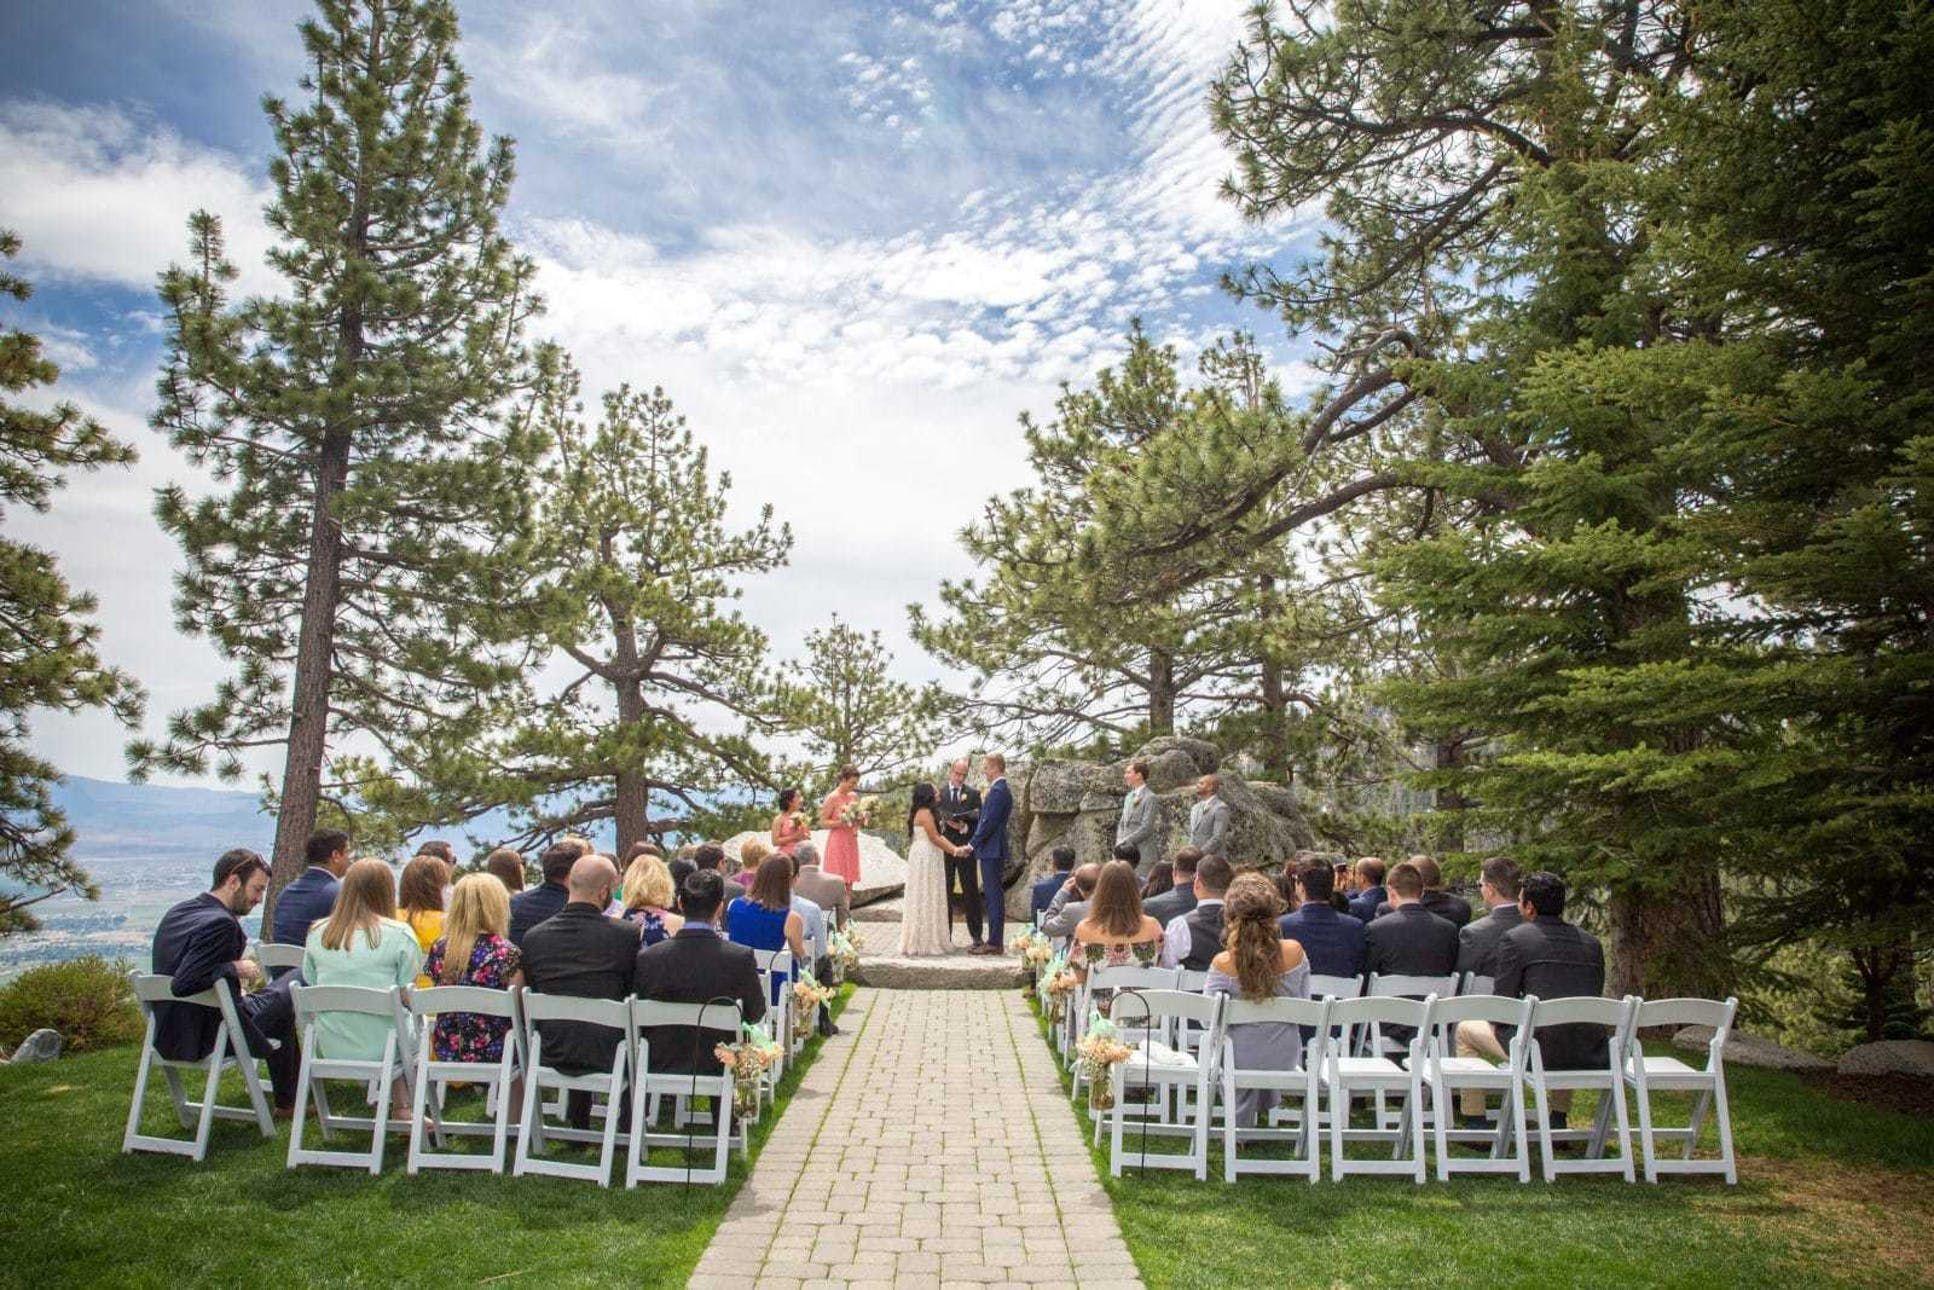 Ridge Tahoe Resort Stateline Weddings Lake… | Here Comes The Guide #outdoor we...#guide #lake #outdoor #resort #ridge #stateline #tahoe #weddings